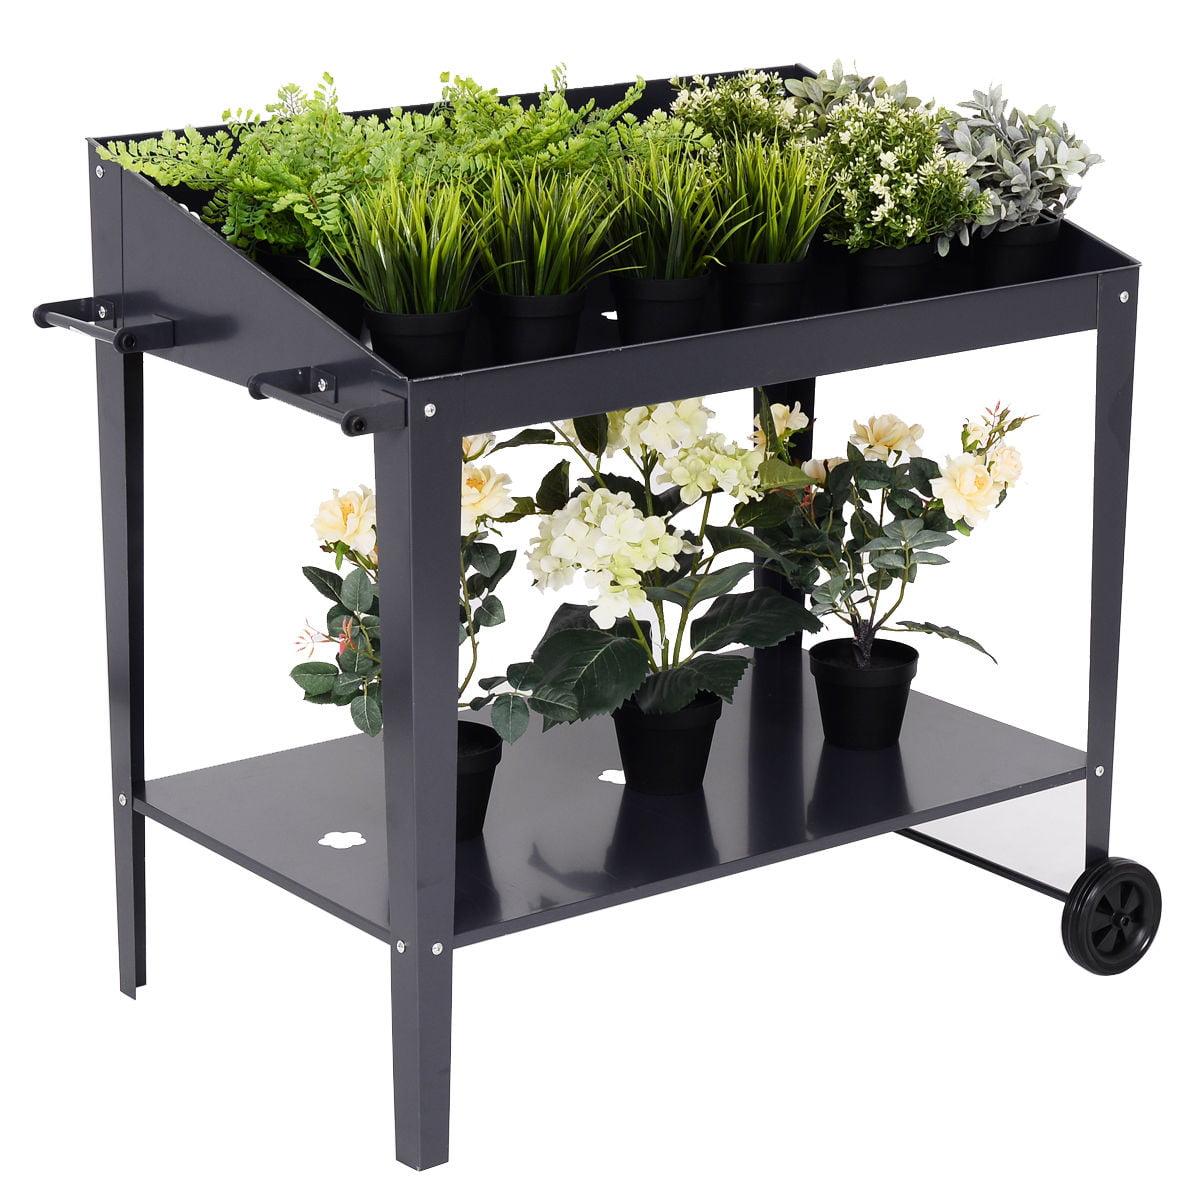 Goplus 35'' x 22'' Raised Garden Bed Potting Bench Work Station Plant Storage Shelf